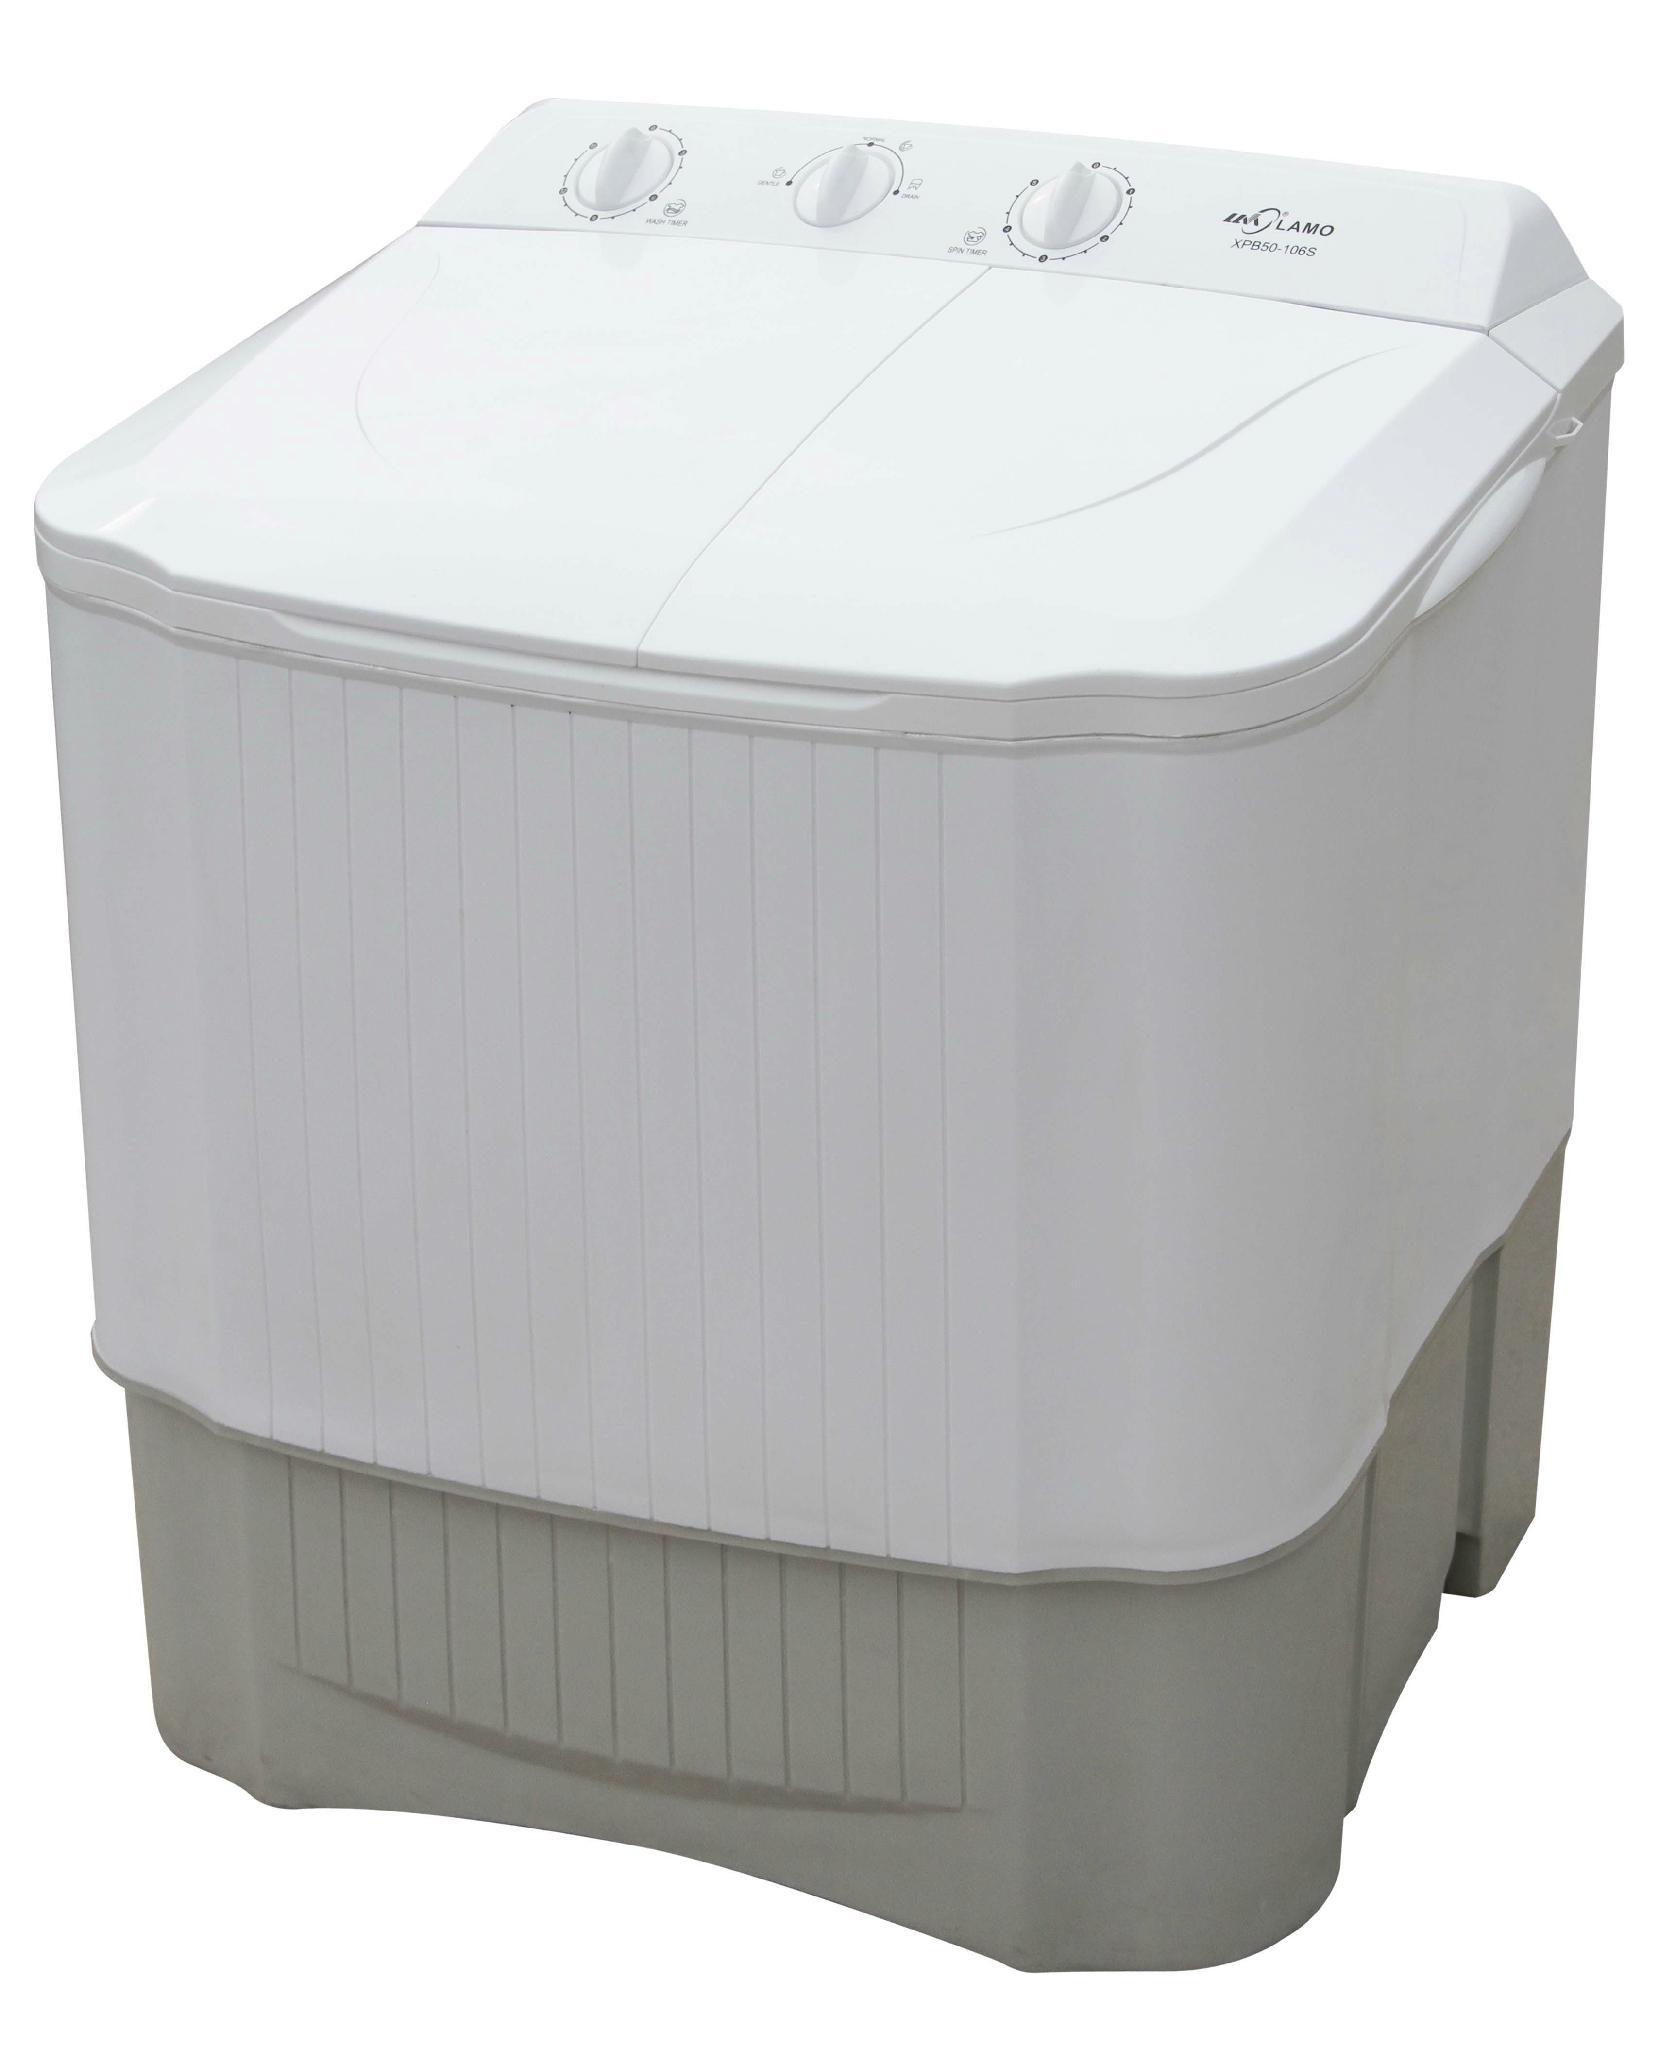 Xpb50-106s Twin-Tub Washing Machine 1